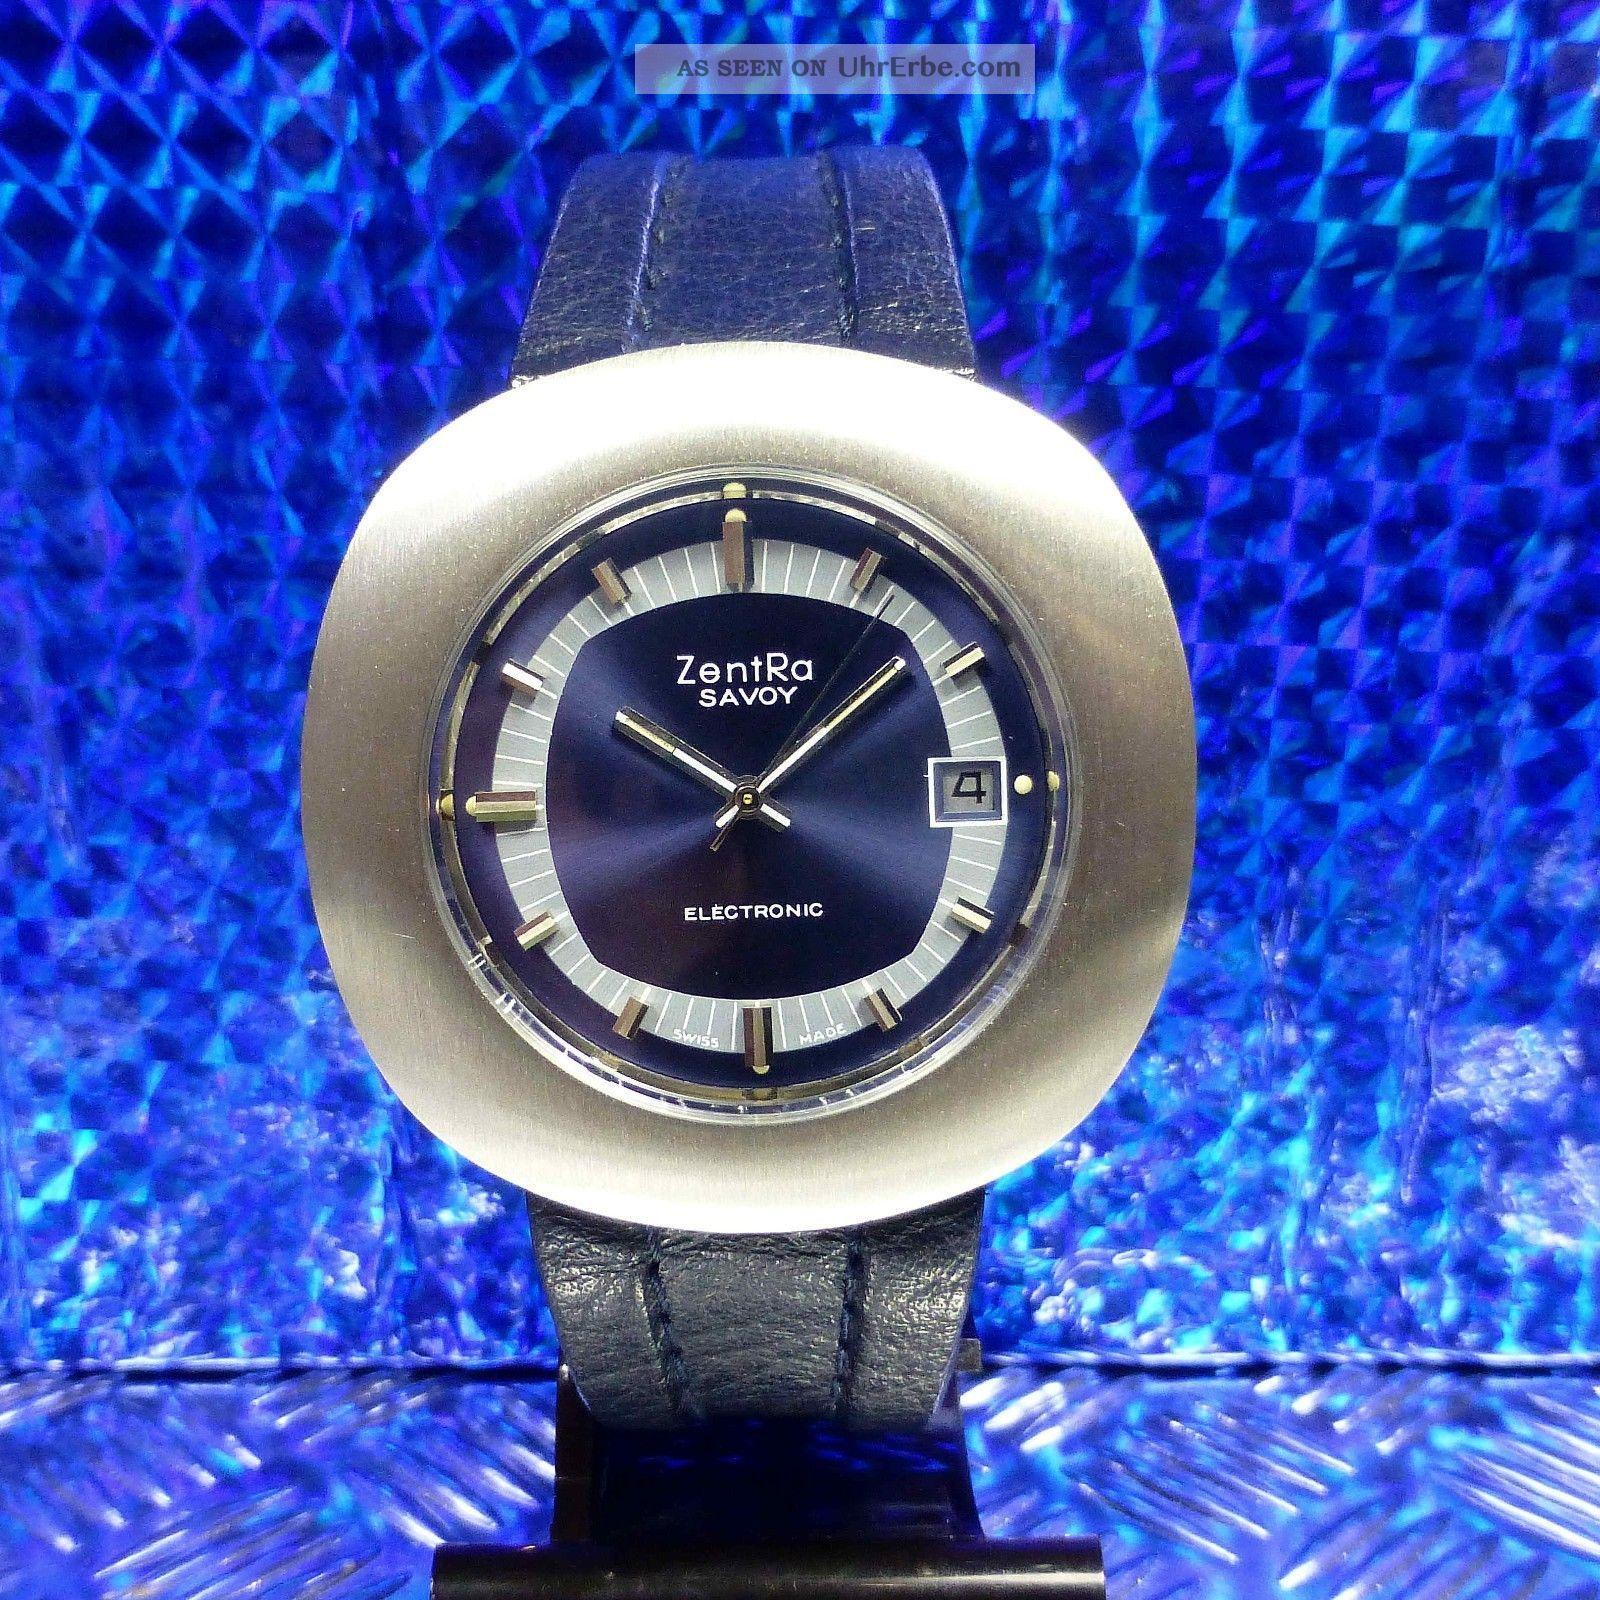 Vintage 70èr Jahre Große Zentra Savoy Dynotron Electronic Esa 9154 Herrenuhr Armbanduhren Bild